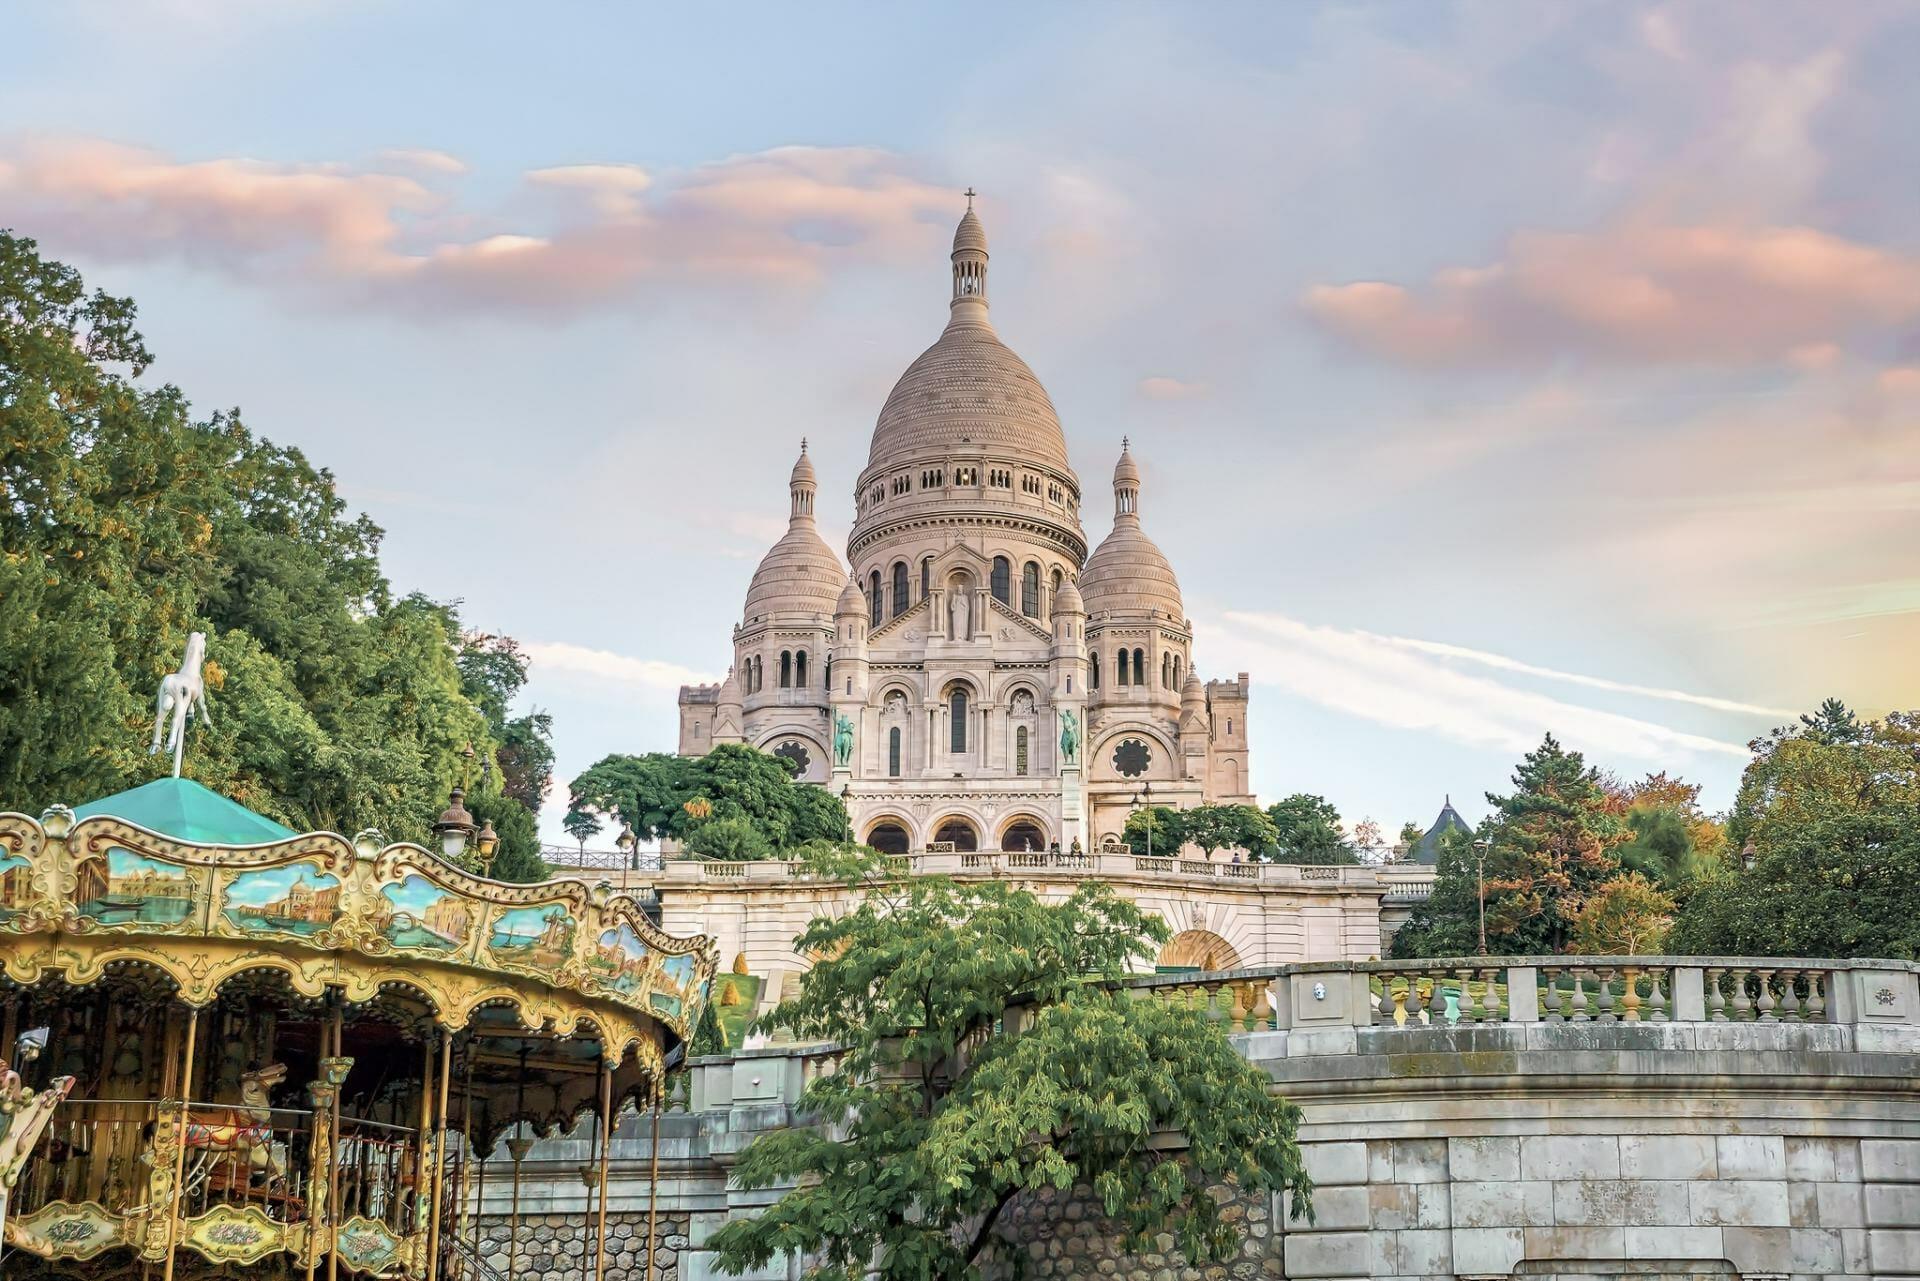 Instagrammable places in Paris - Sacre Coeur